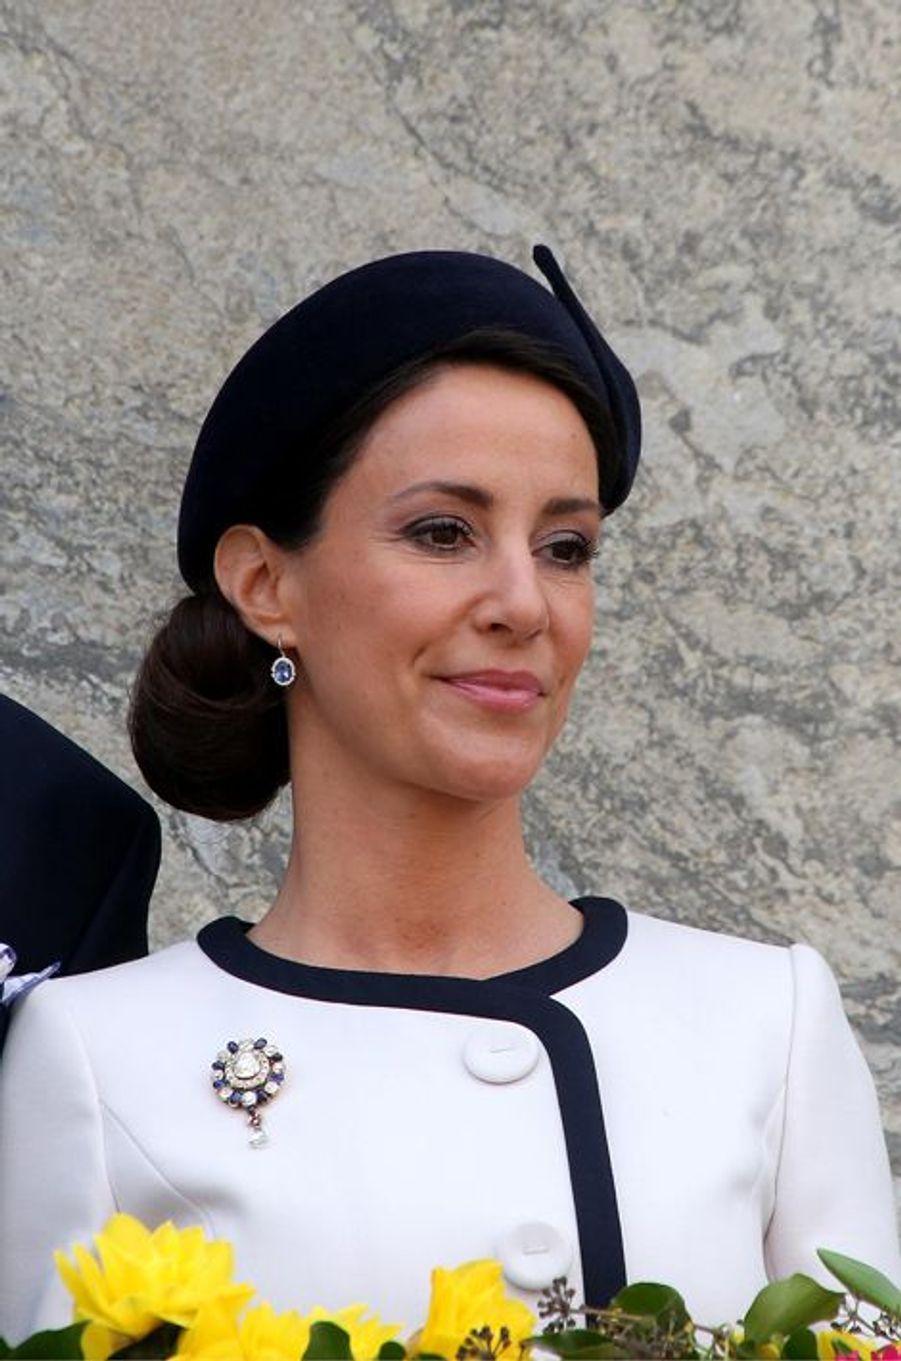 La princesse Marie de Danemark à Aarhus, le 8 avril 2015